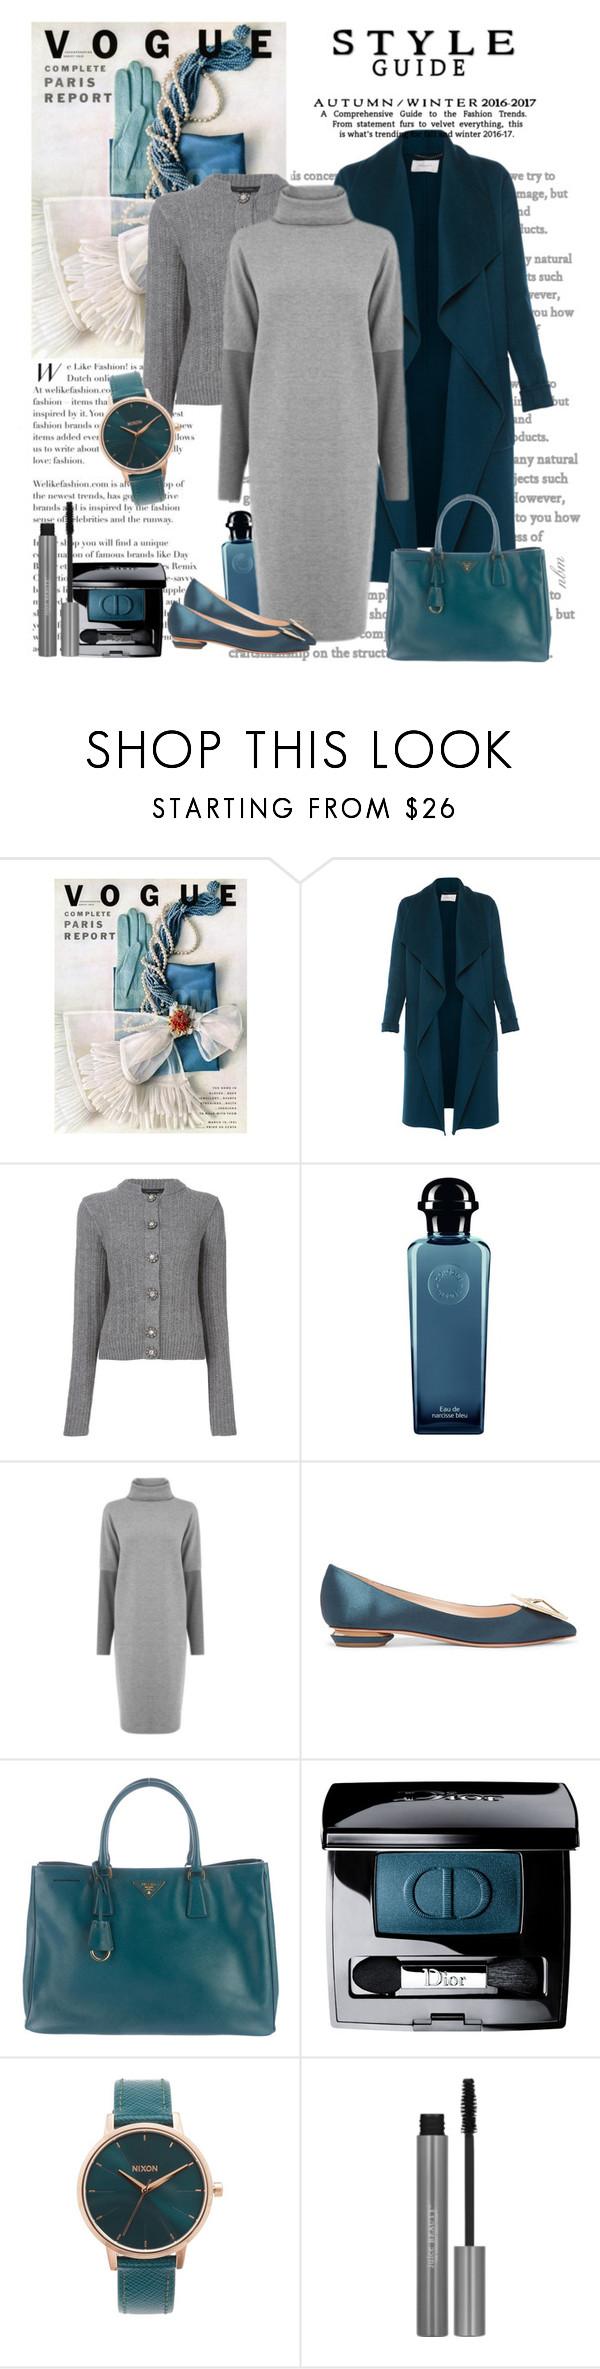 """Teal and Grey"" by nadine-b-martin ❤ liked on Polyvore featuring L.K.Bennett, Marc Jacobs, Hermès, Warehouse, Nicholas Kirkwood, Prada, Christian Dior and Nixon"